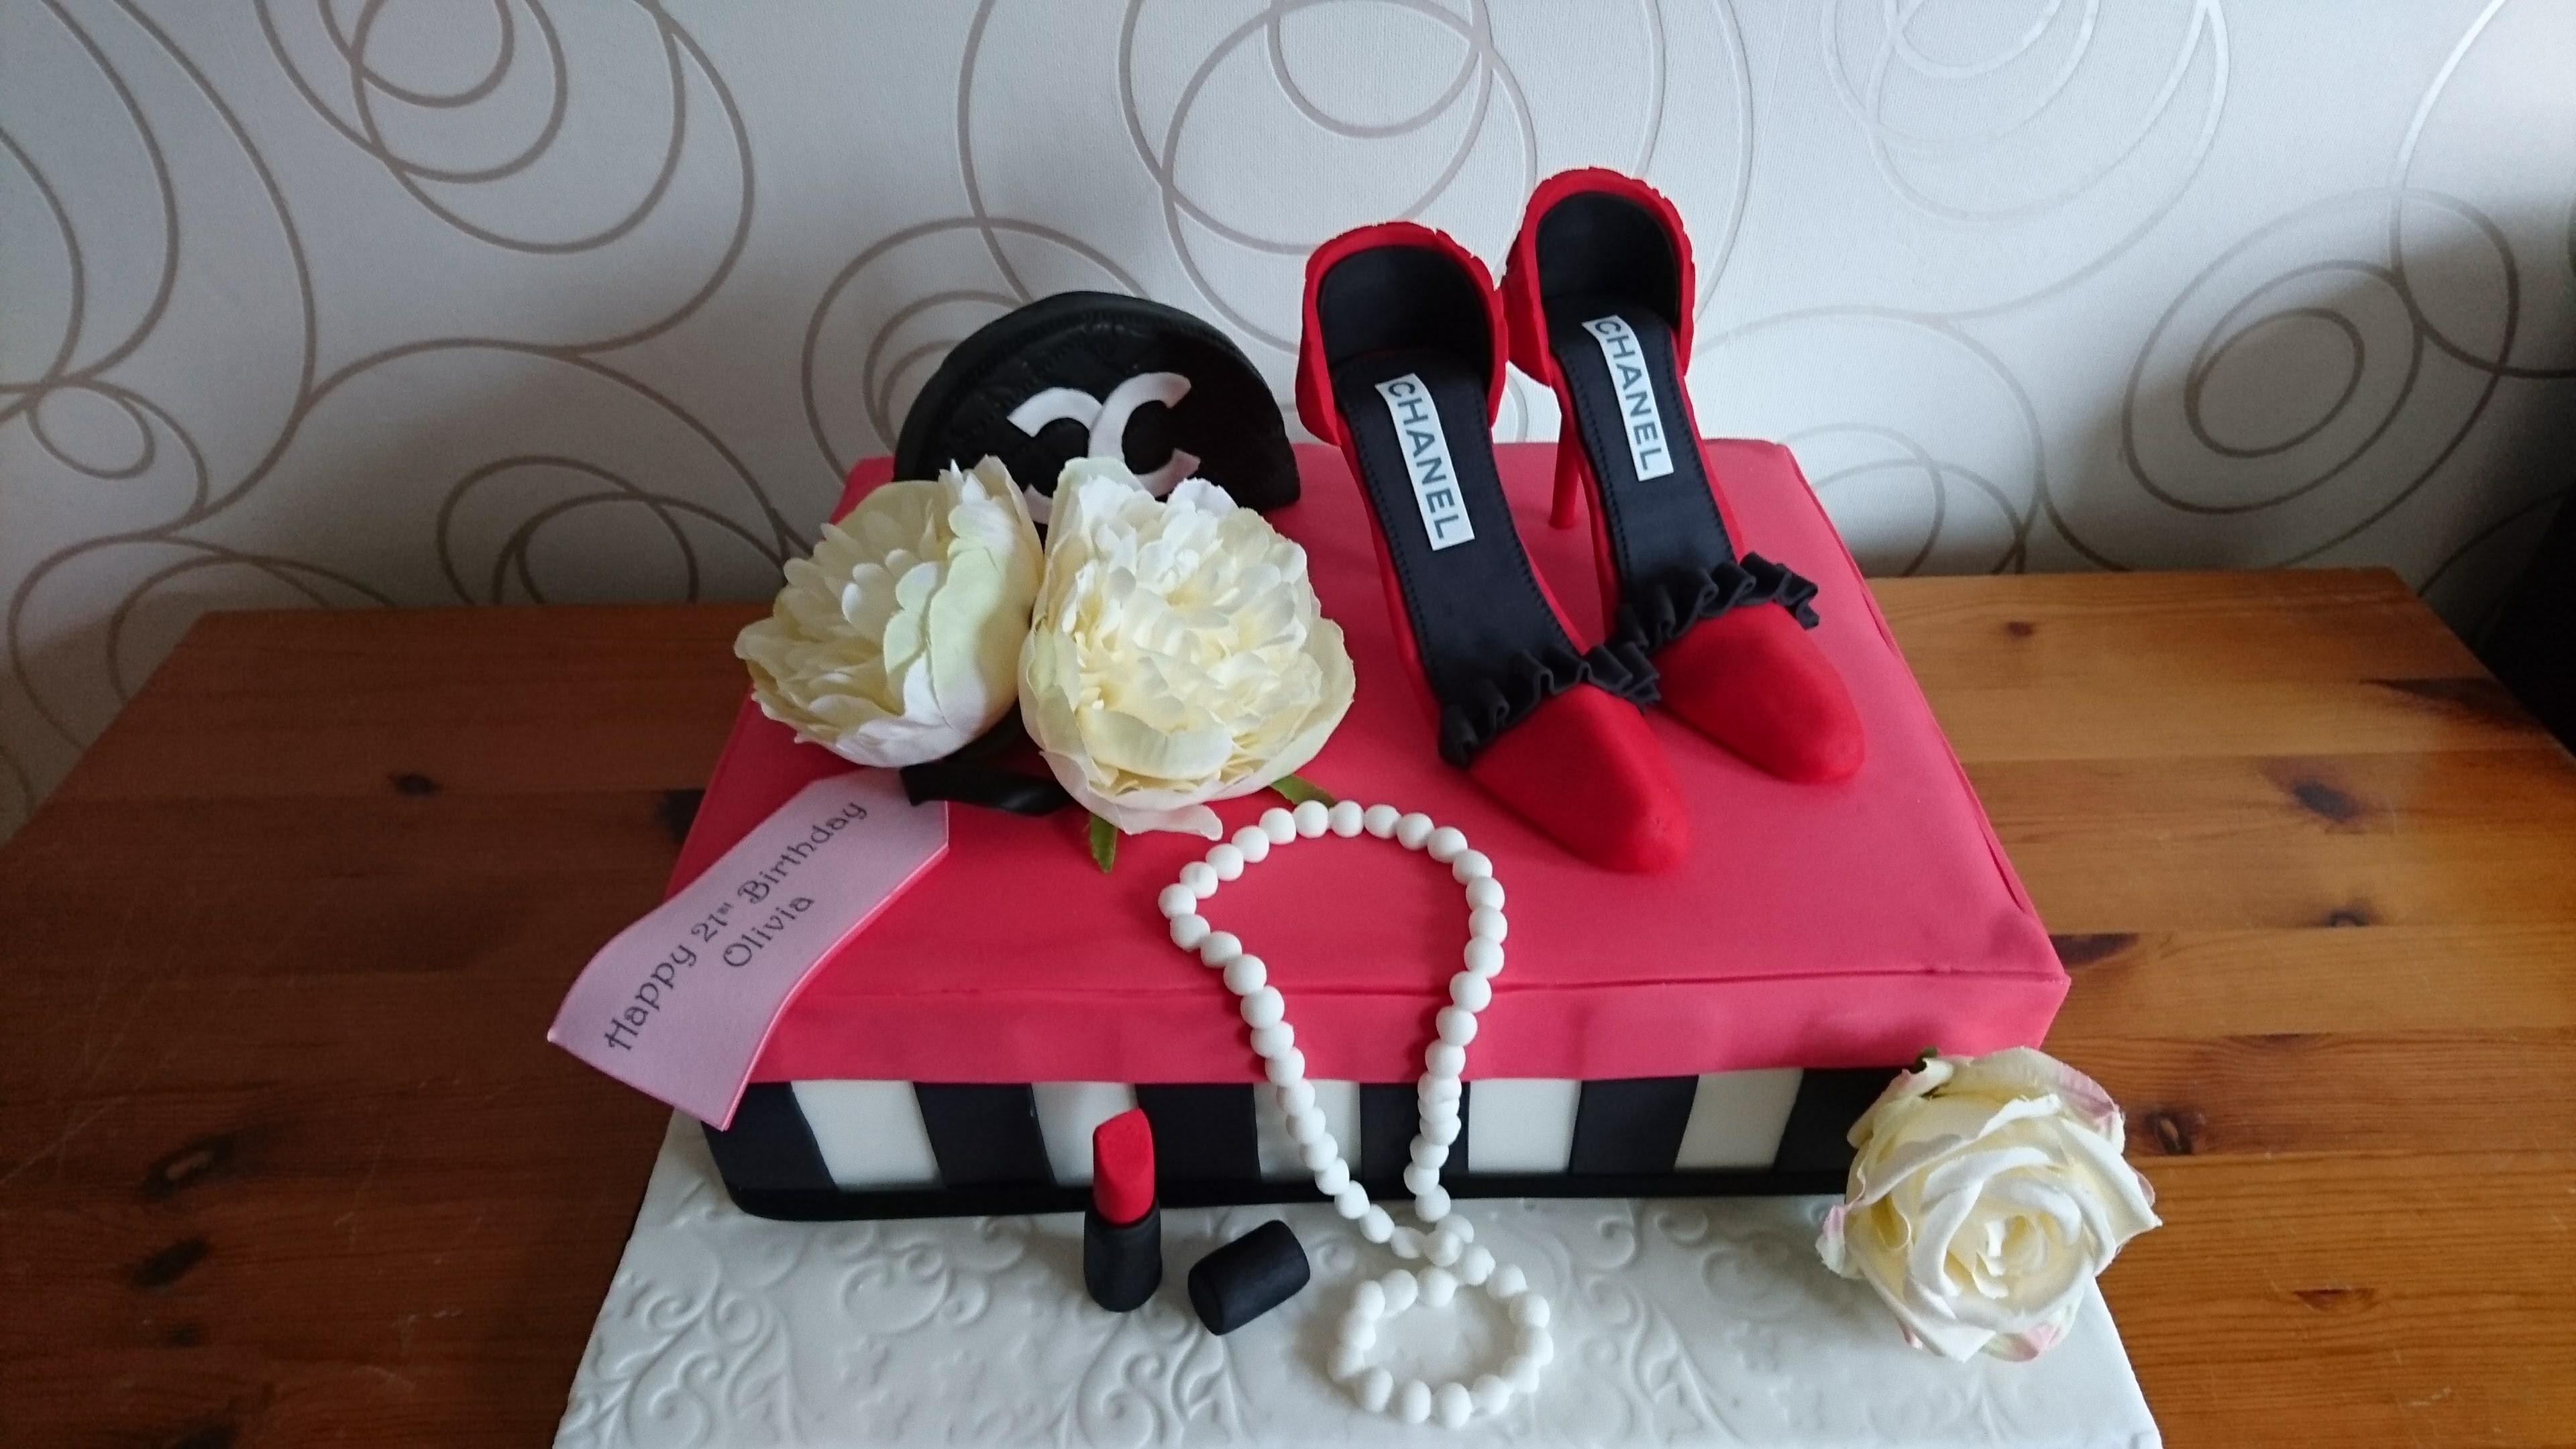 Make Up & Shoe Box Cake